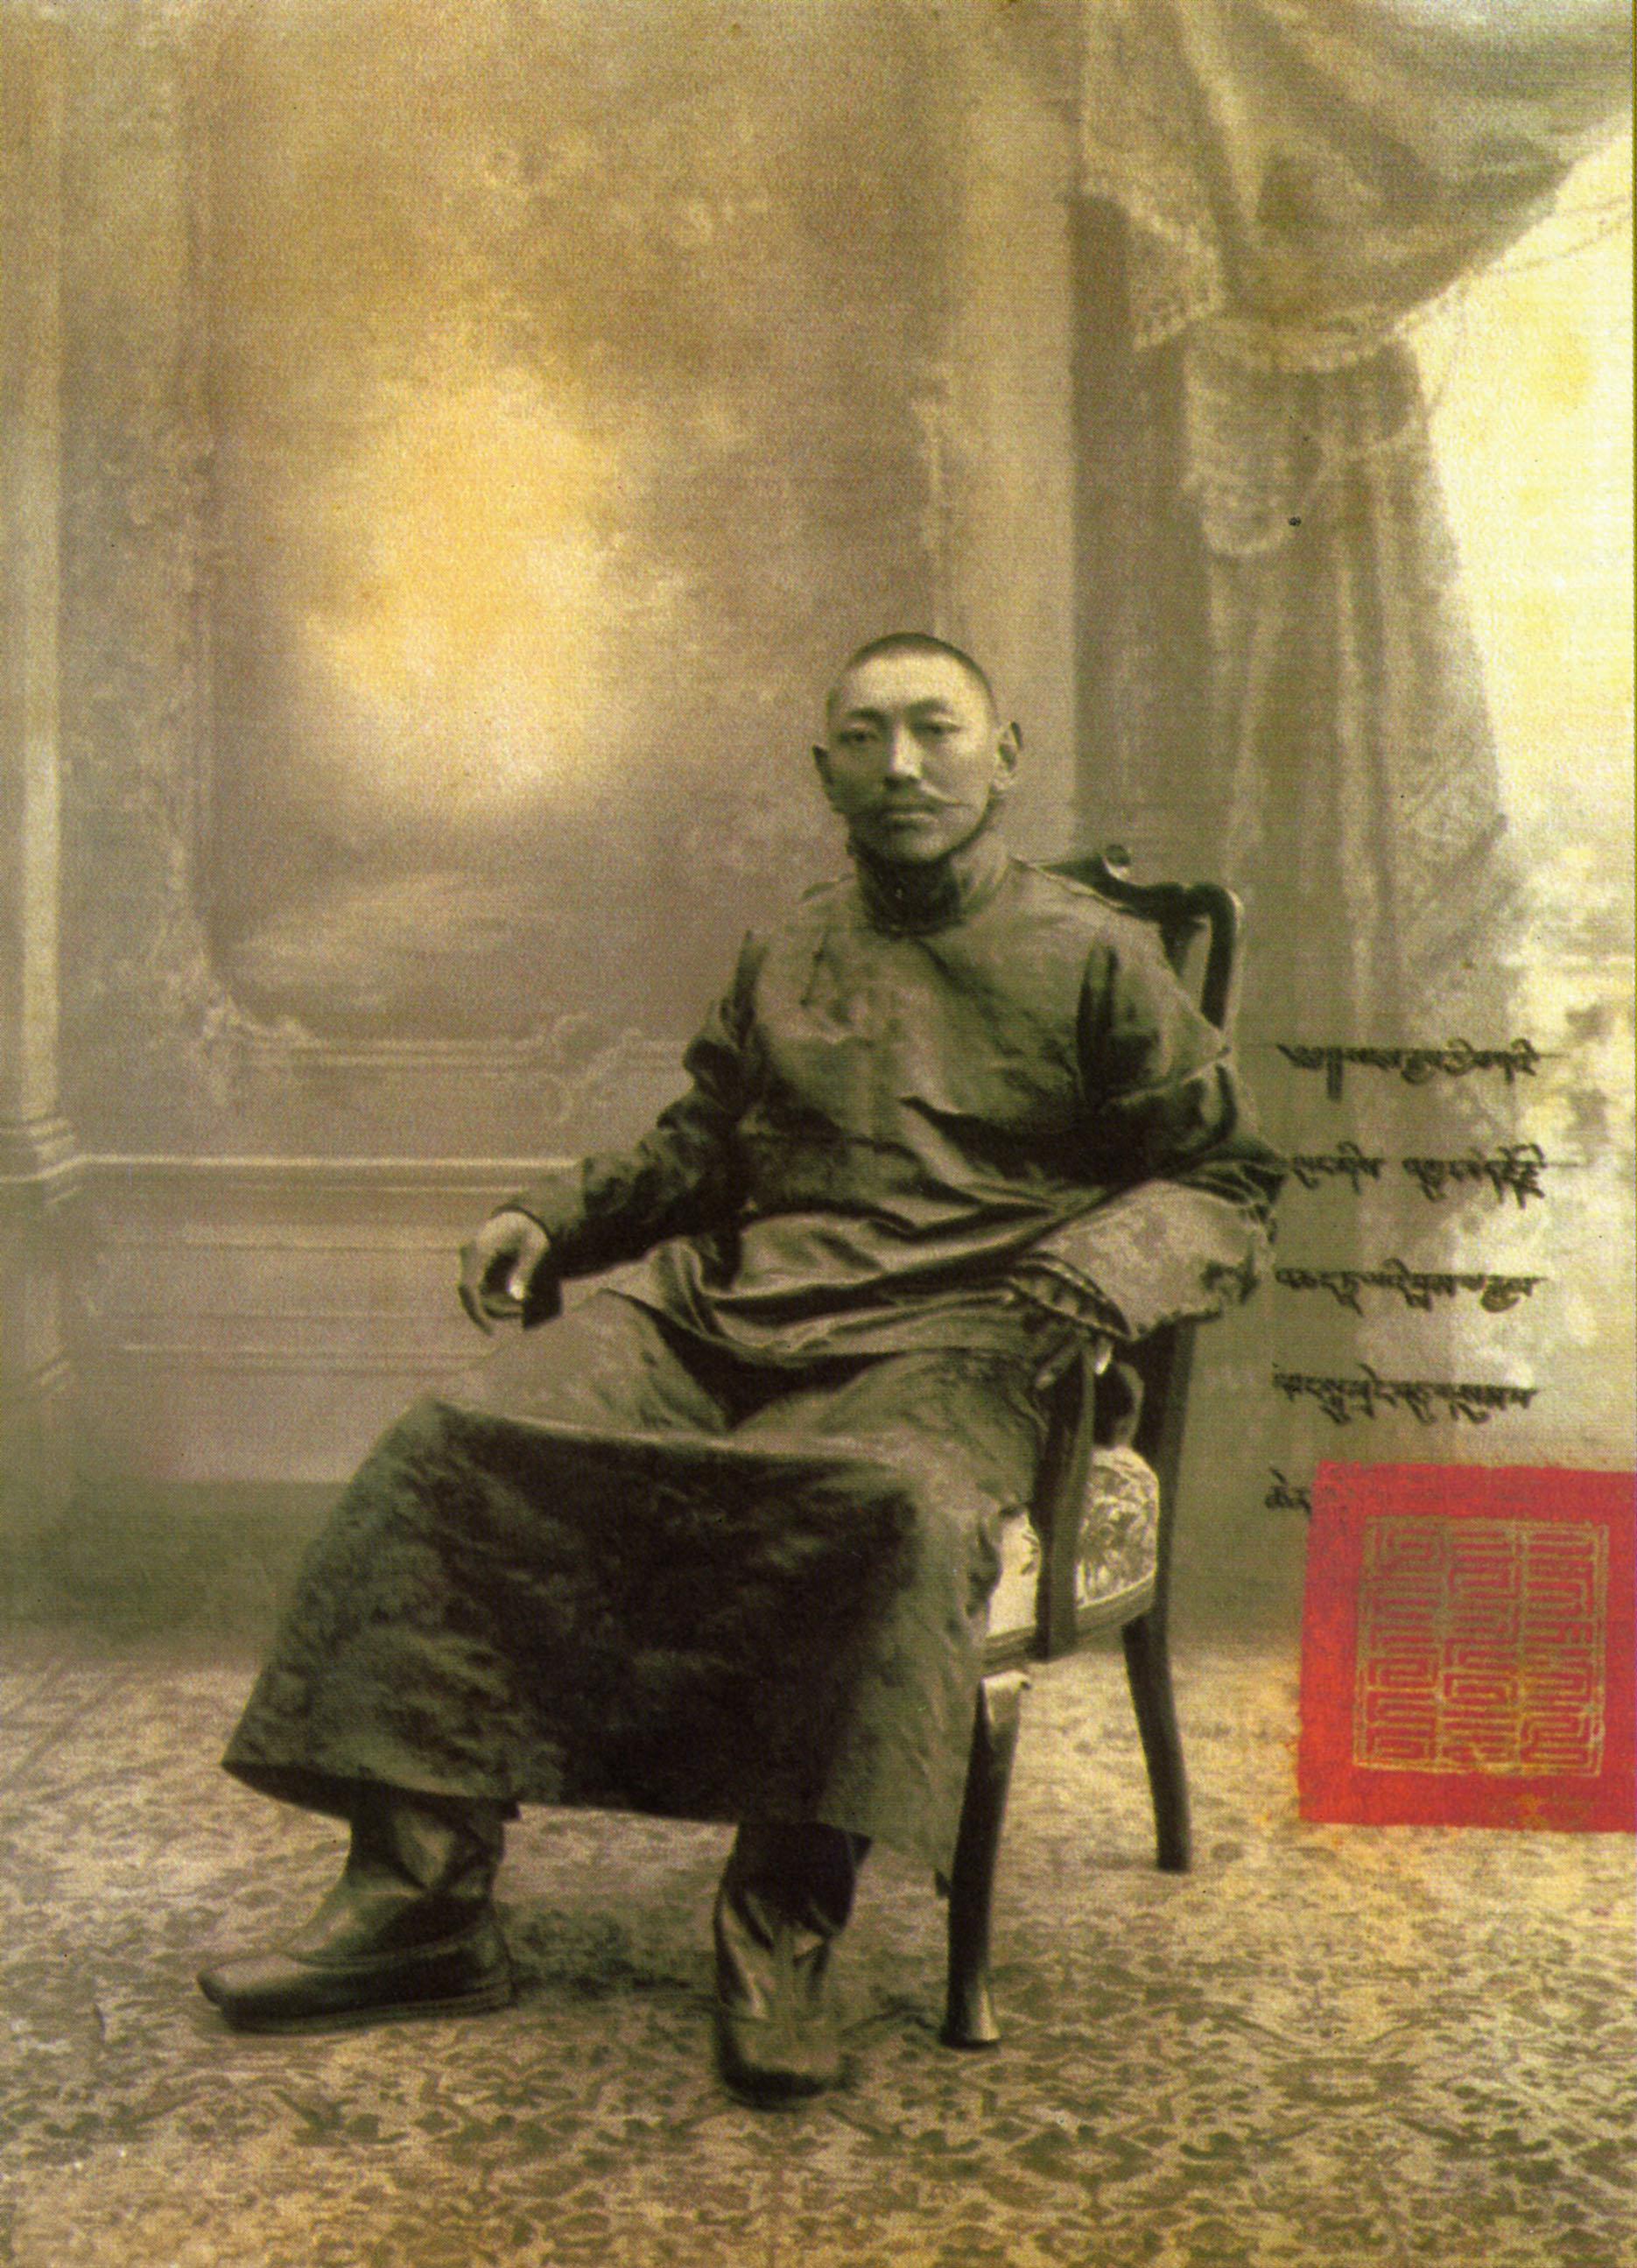 the thirteenth dalai lama tubten gyatso by tsering shakya 13thdalailama6 jpg